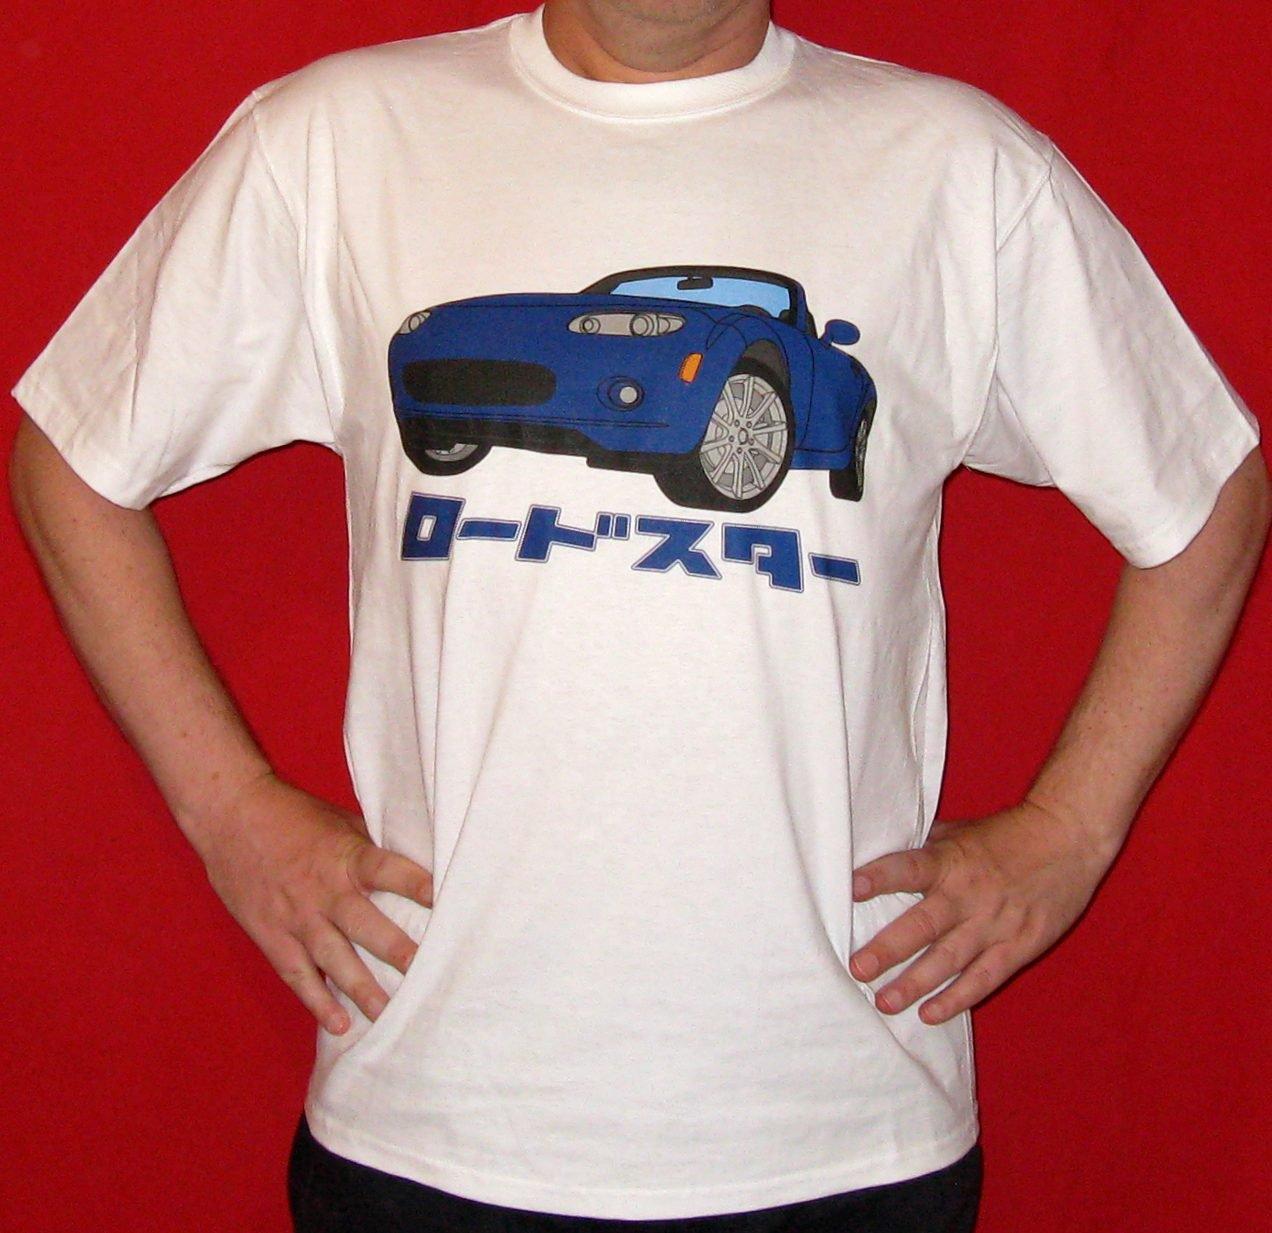 Third Generation Mazda MX-5 Miata T-Shirt - Roadster